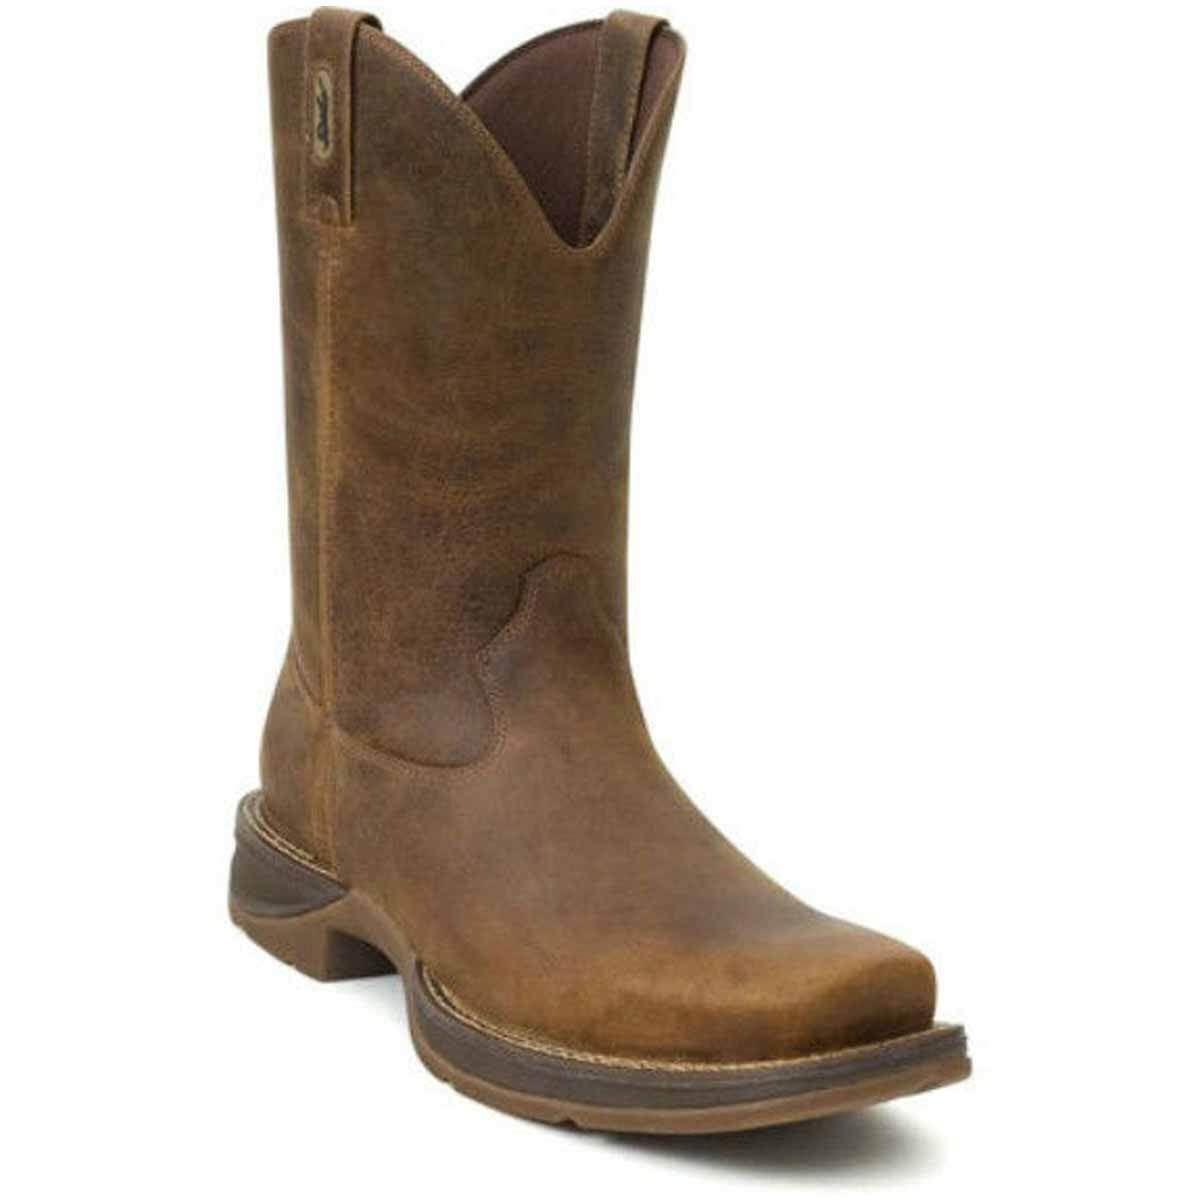 Durango Rebel DB5444 Homme 11  Marron À Enfiler Western Cowboy bottes